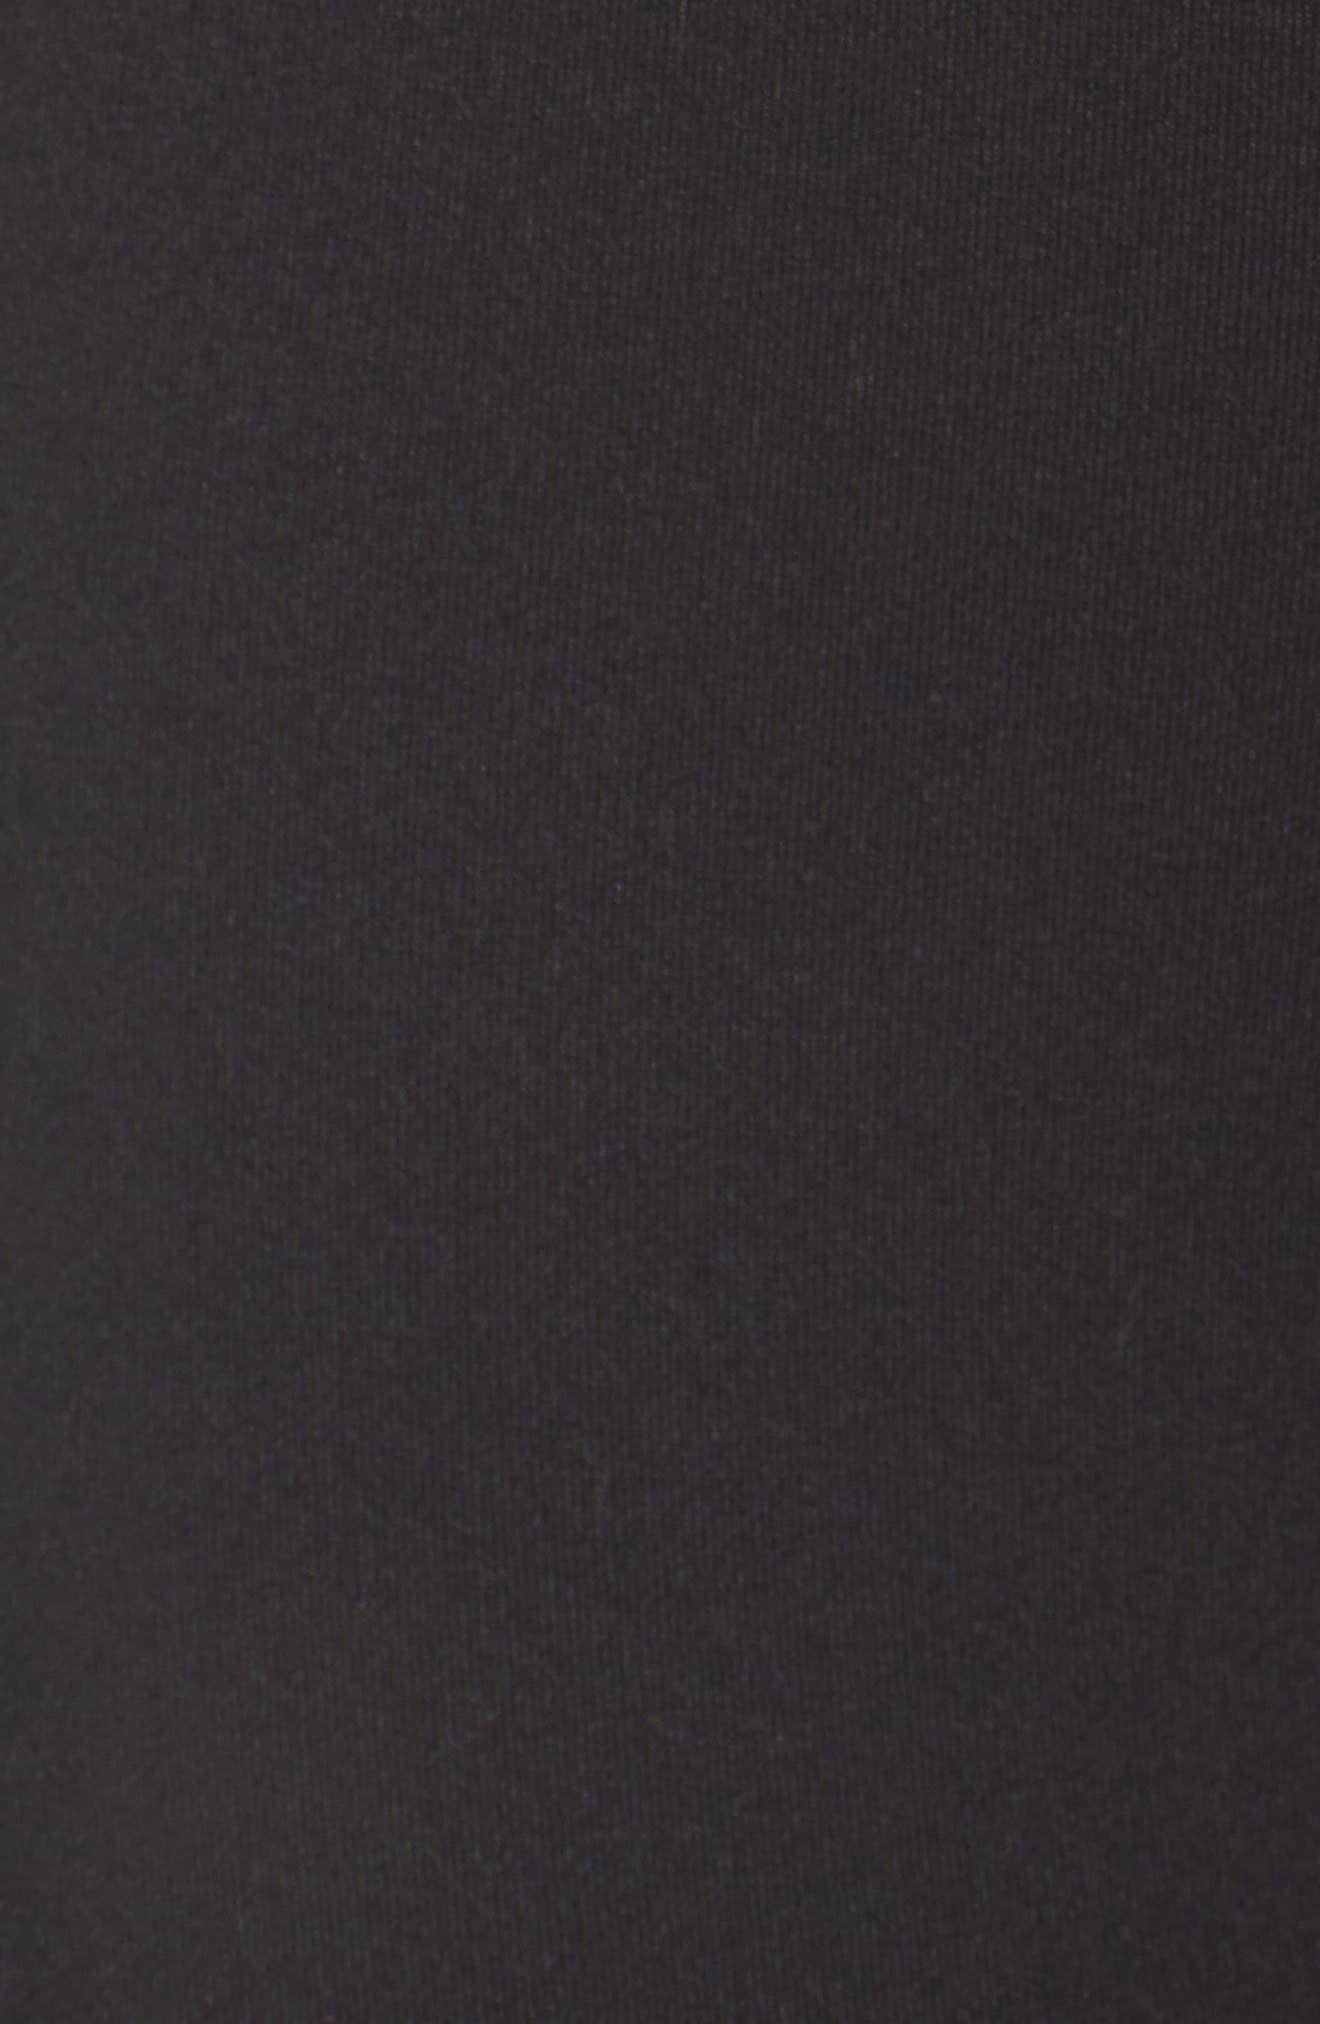 ZELLA, Impulse High Waist Midi Leggings, Alternate thumbnail 5, color, 001